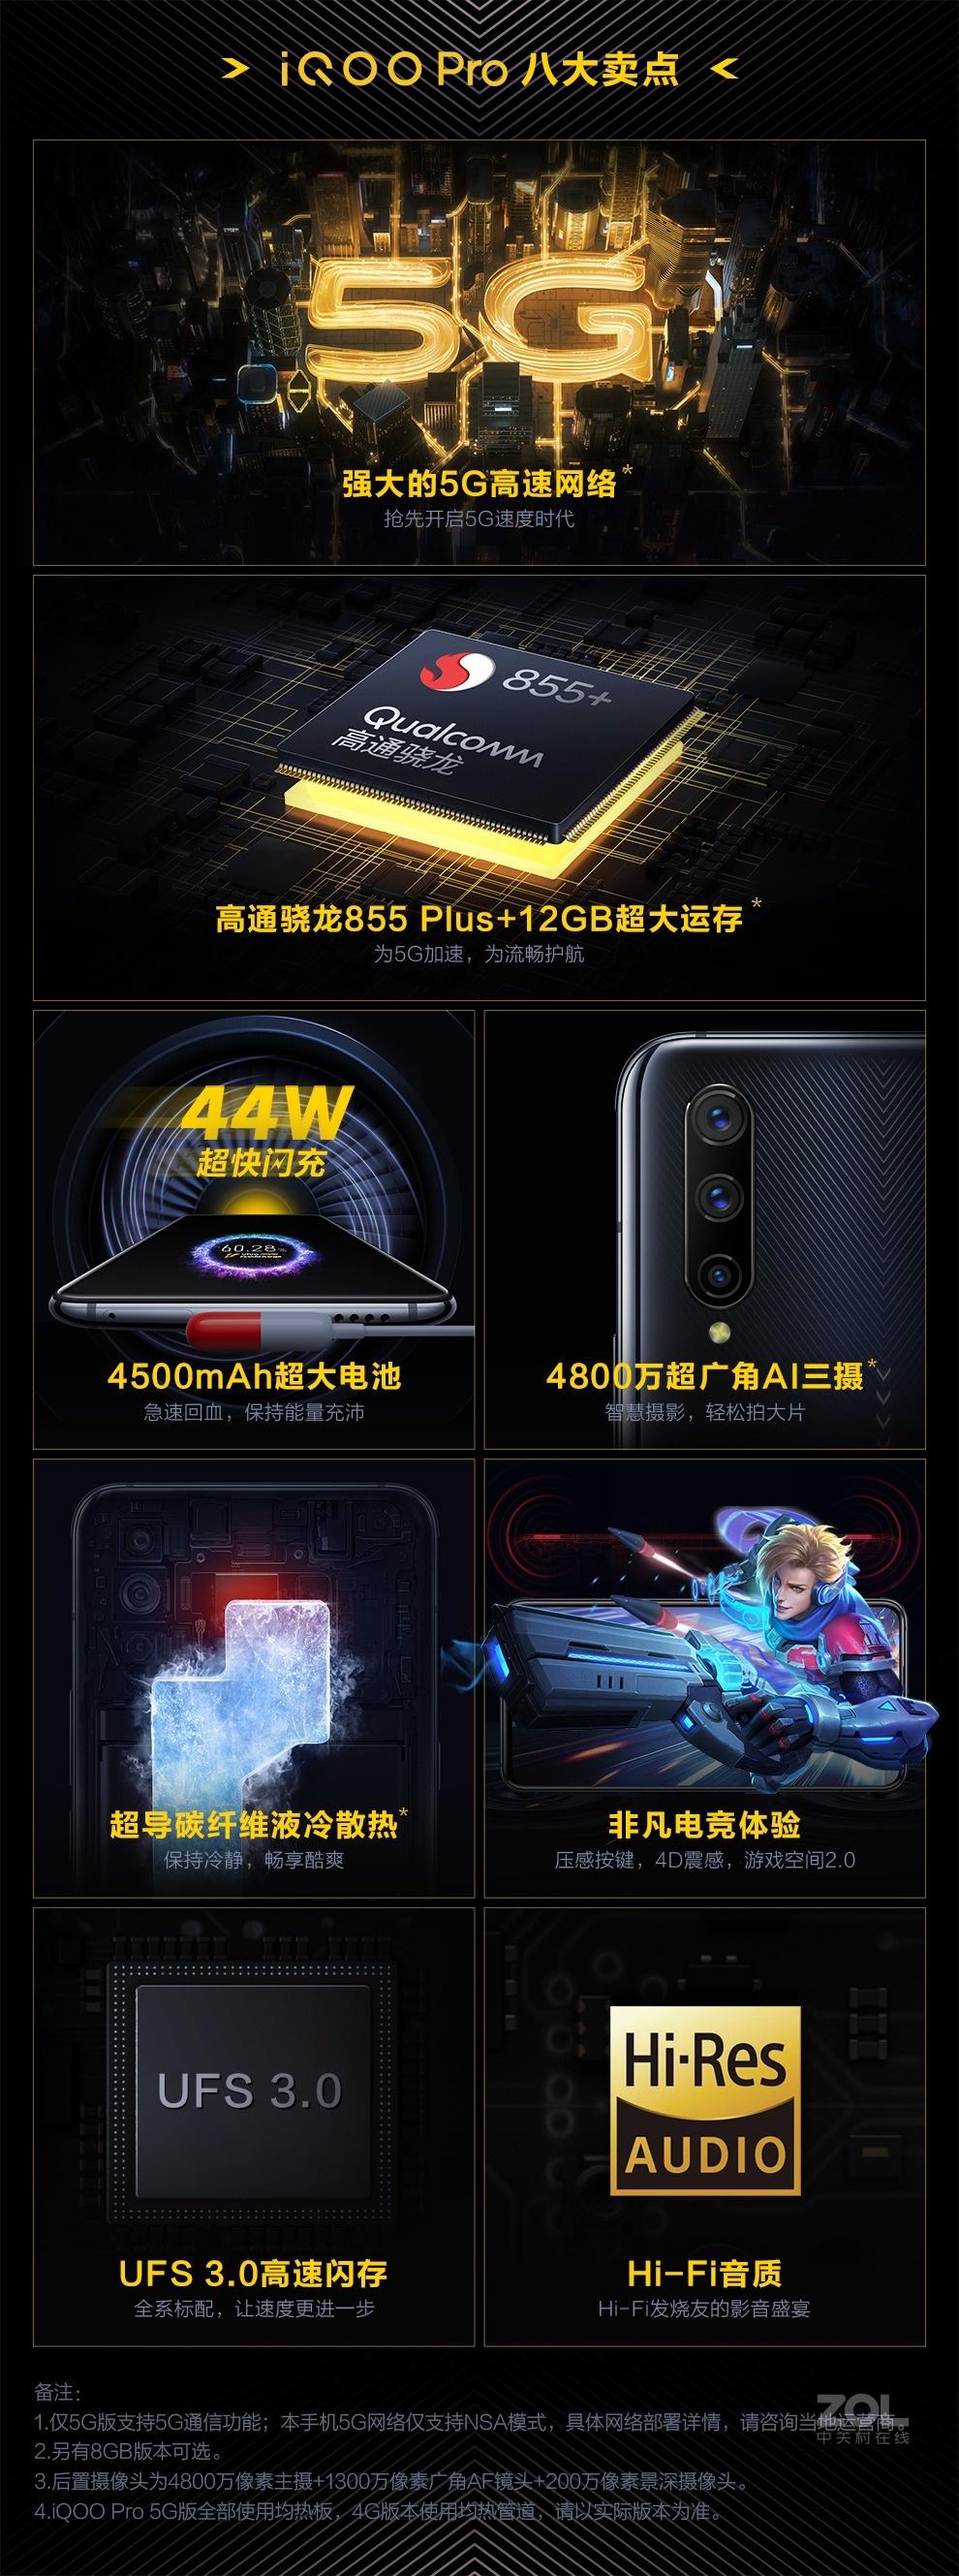 vivo iQOO Pro(8GB/128GB/5G全网通)评测图解产品亮点图片1